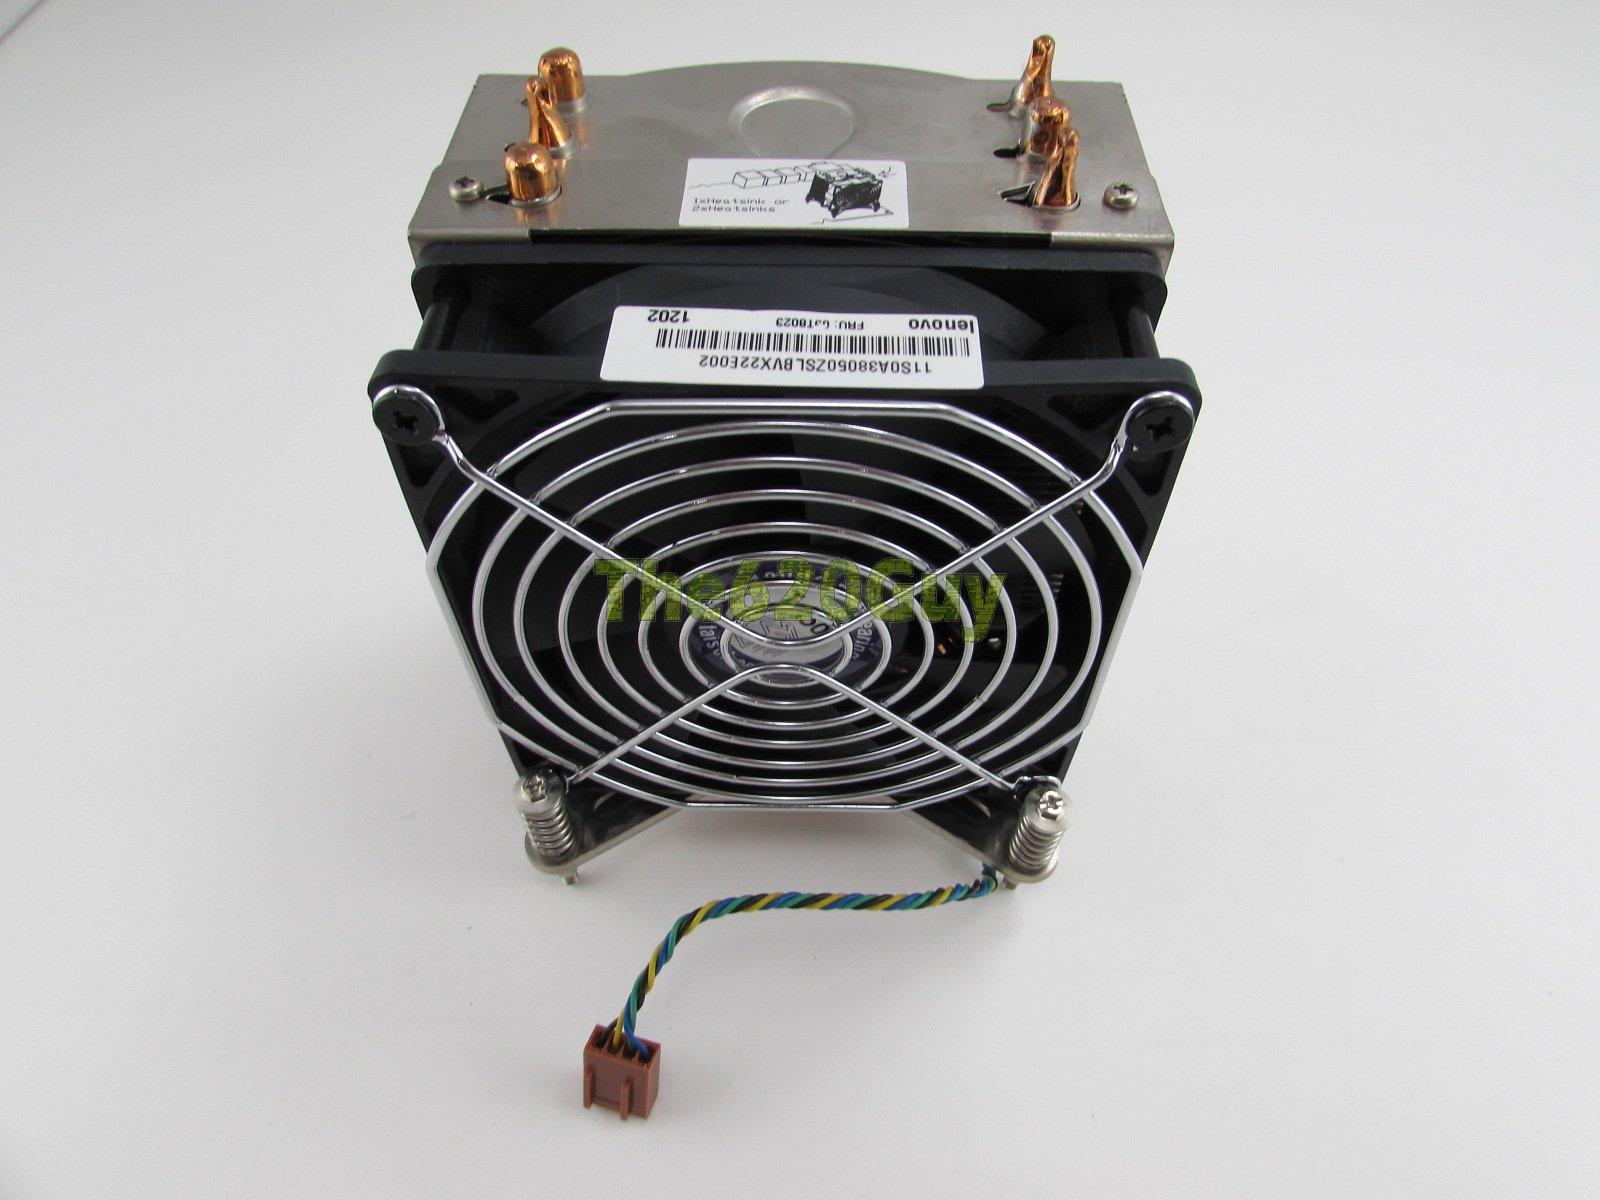 Lot of 2 IBM 49Y4820 49Y5341 CPU Cooling Server Heatsink For X3550 X3650 M2//M3